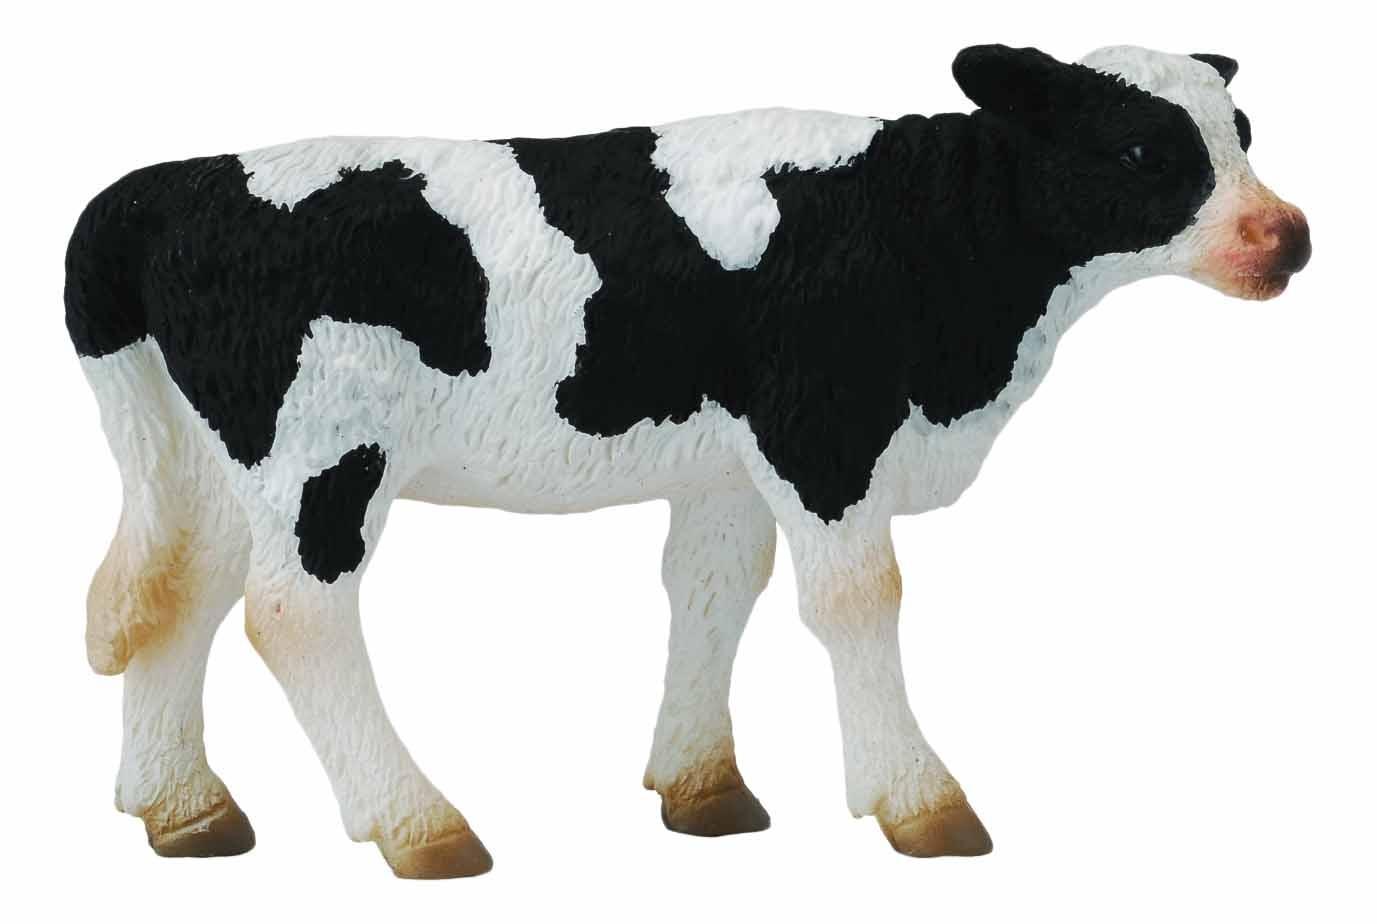 Фигурка collecta фризский теленок - стоячий